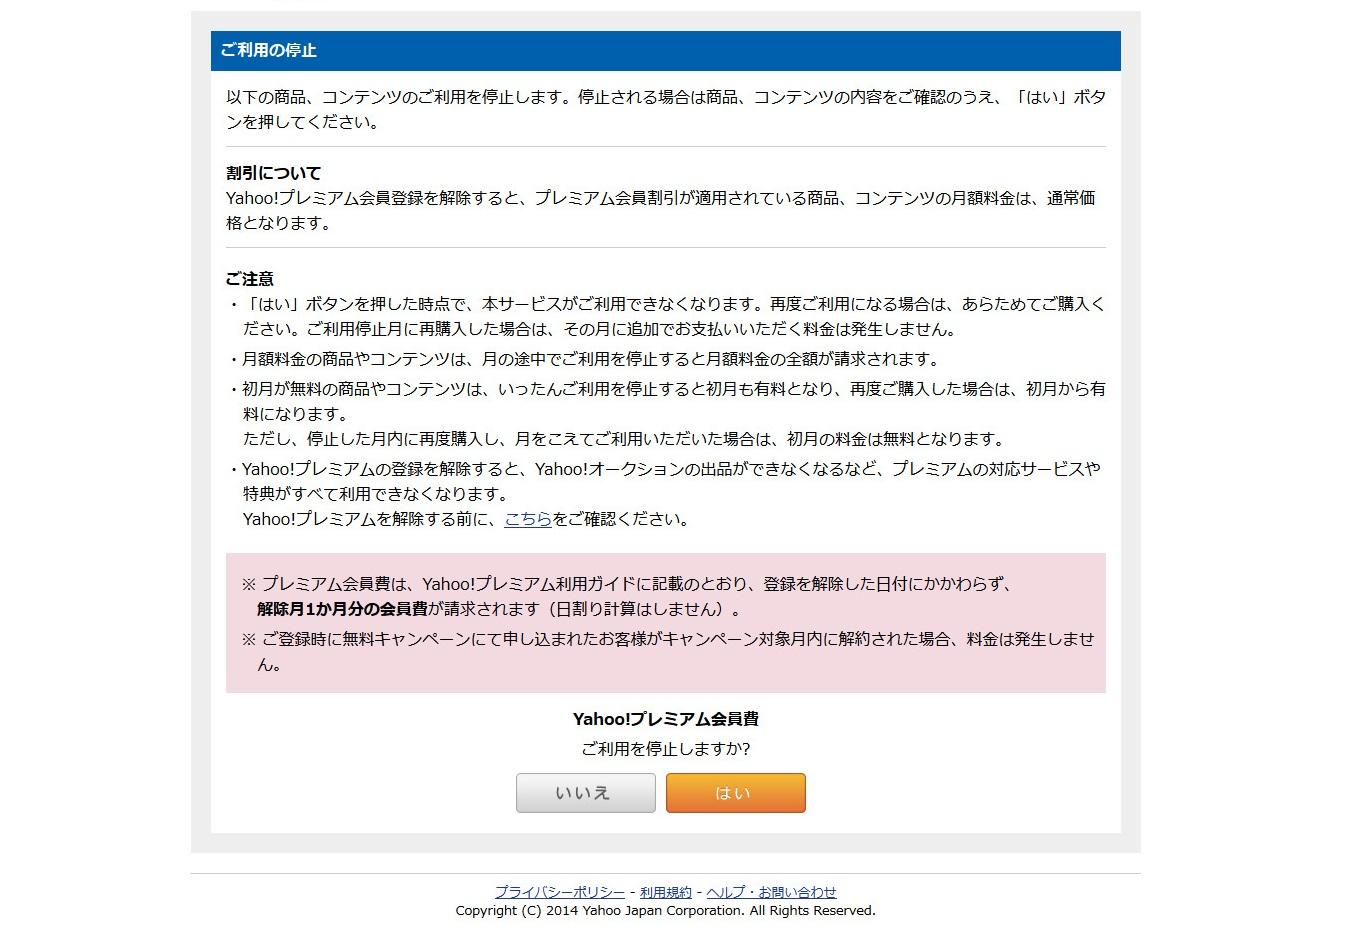 Yahoo!プレミアム2